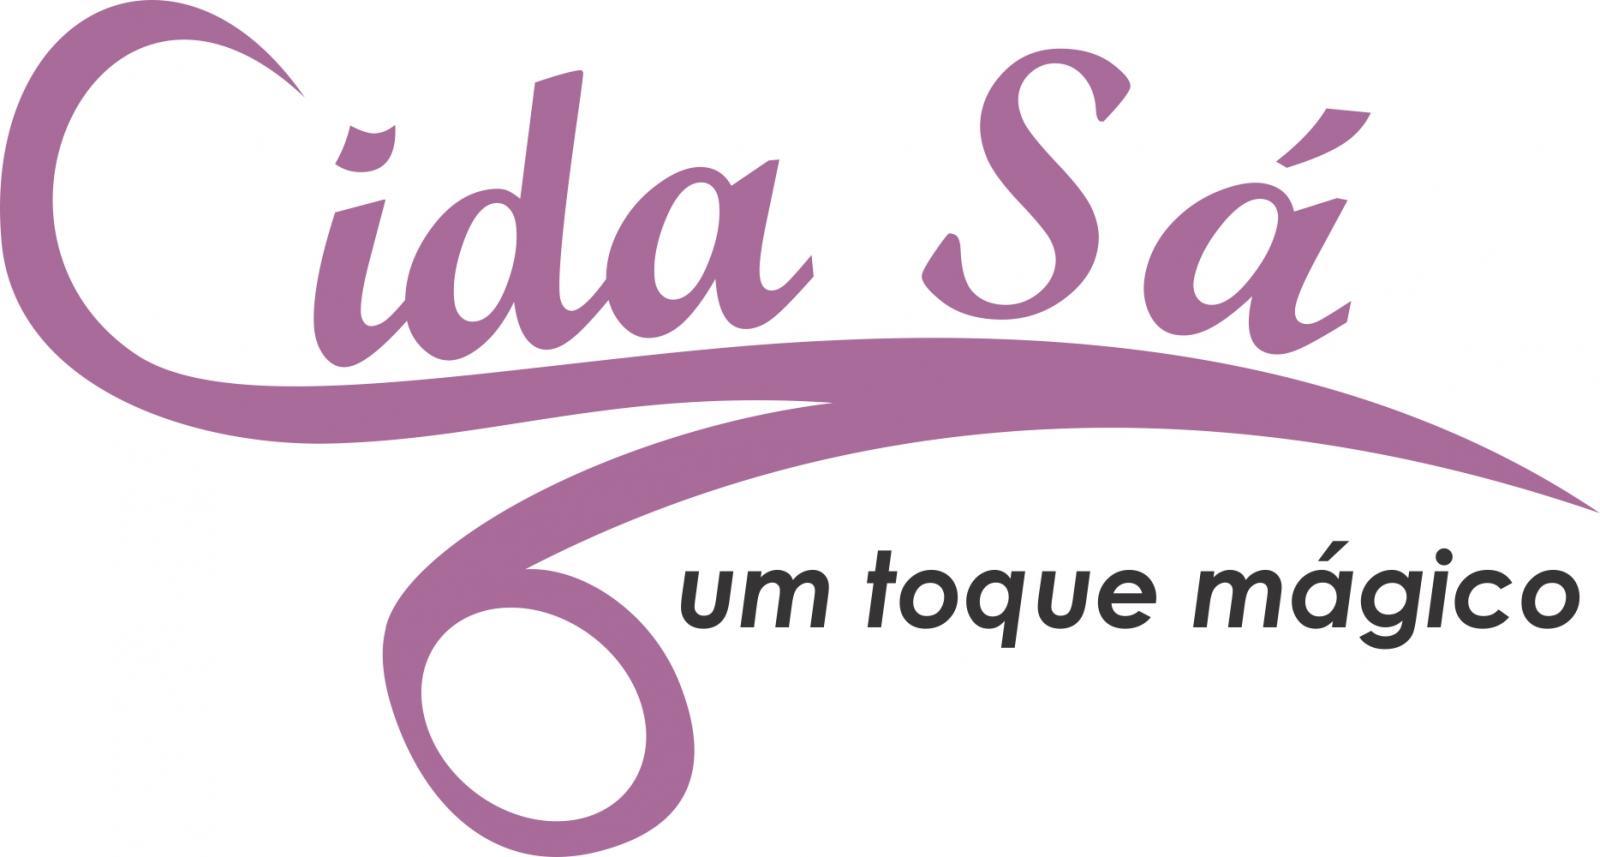 Logo Cida Sá